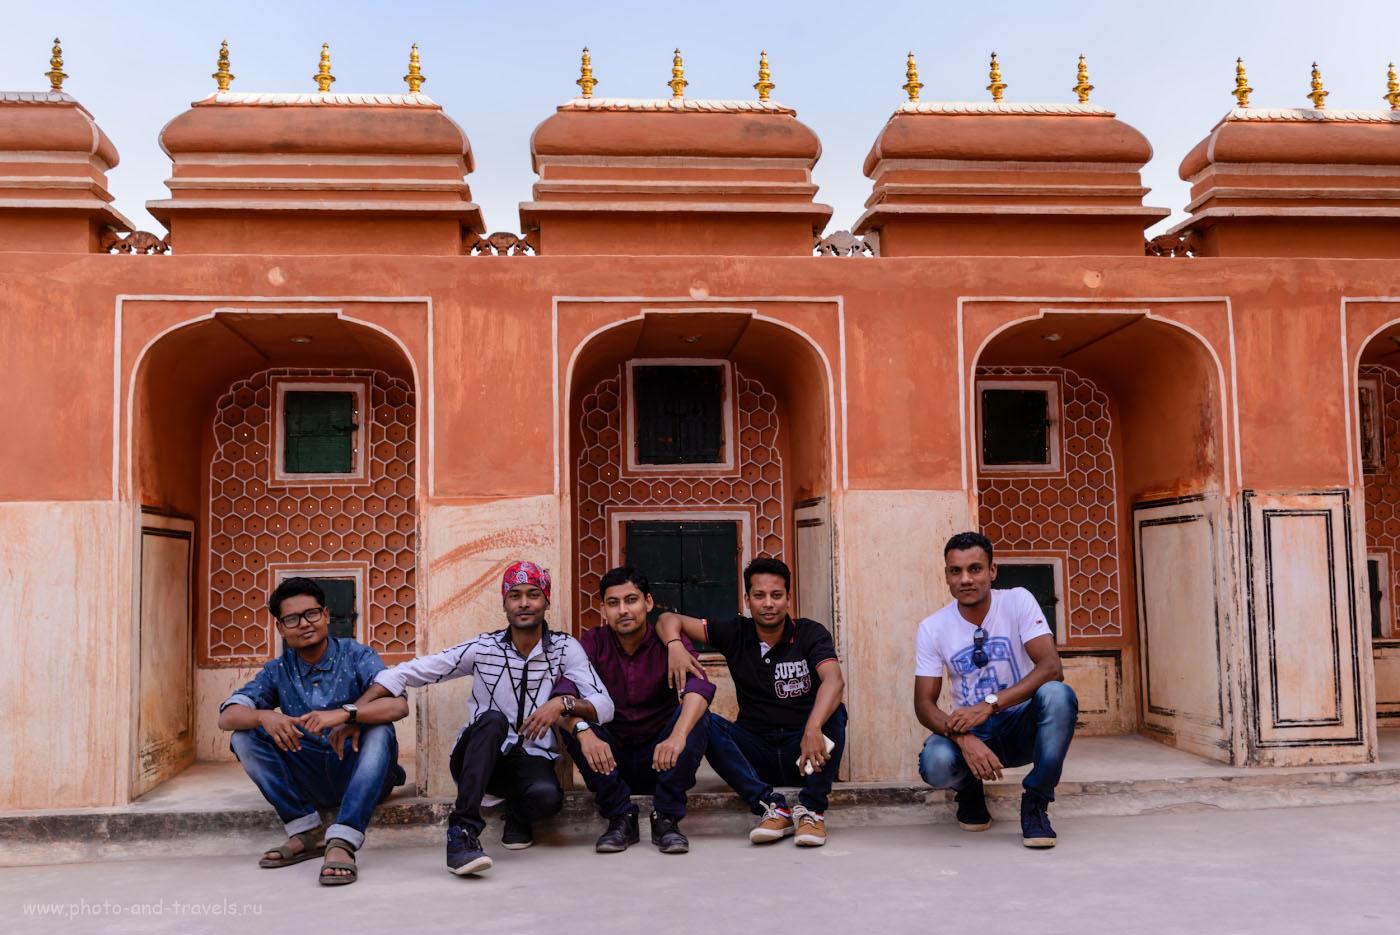 Фото 16. Индийские туристы на крыше дворца Хава-Махал в Джайпуре. 1/100, -0.33, 7.1, 100, 35.